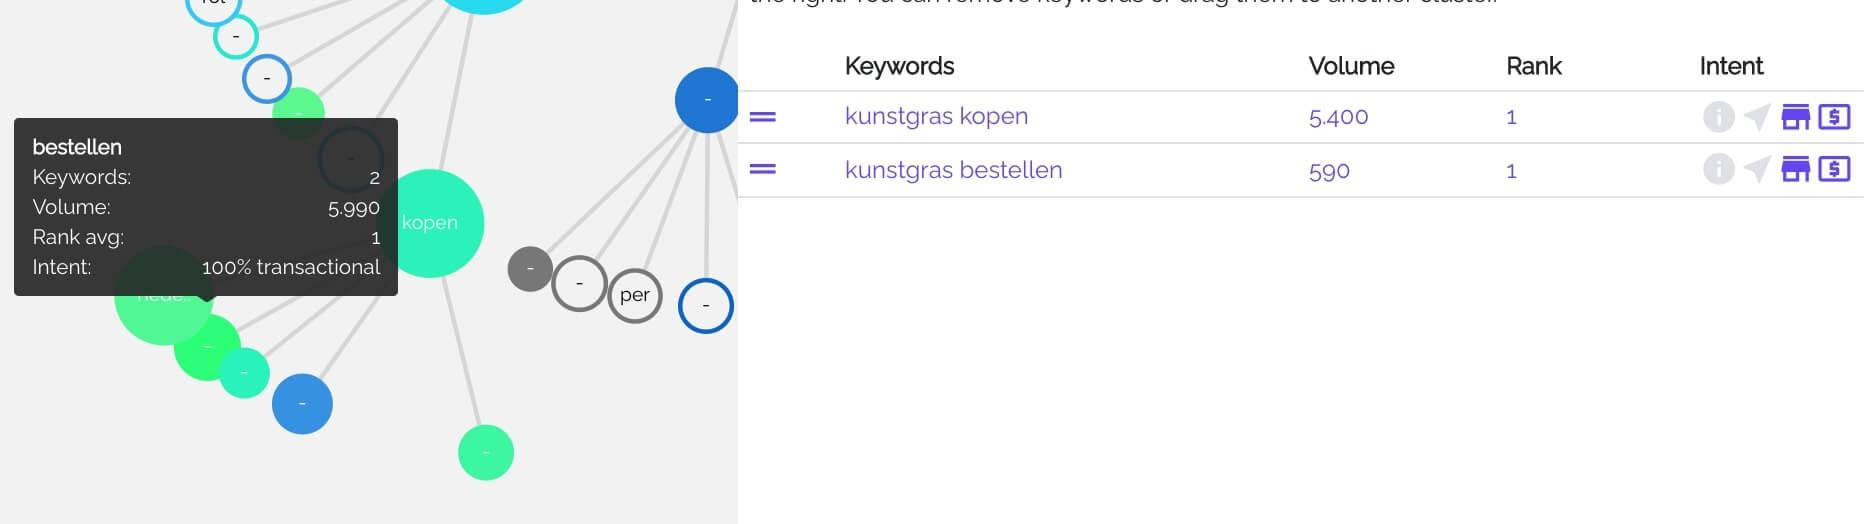 Screenshot KeyWI query 'kunstgras kopen'